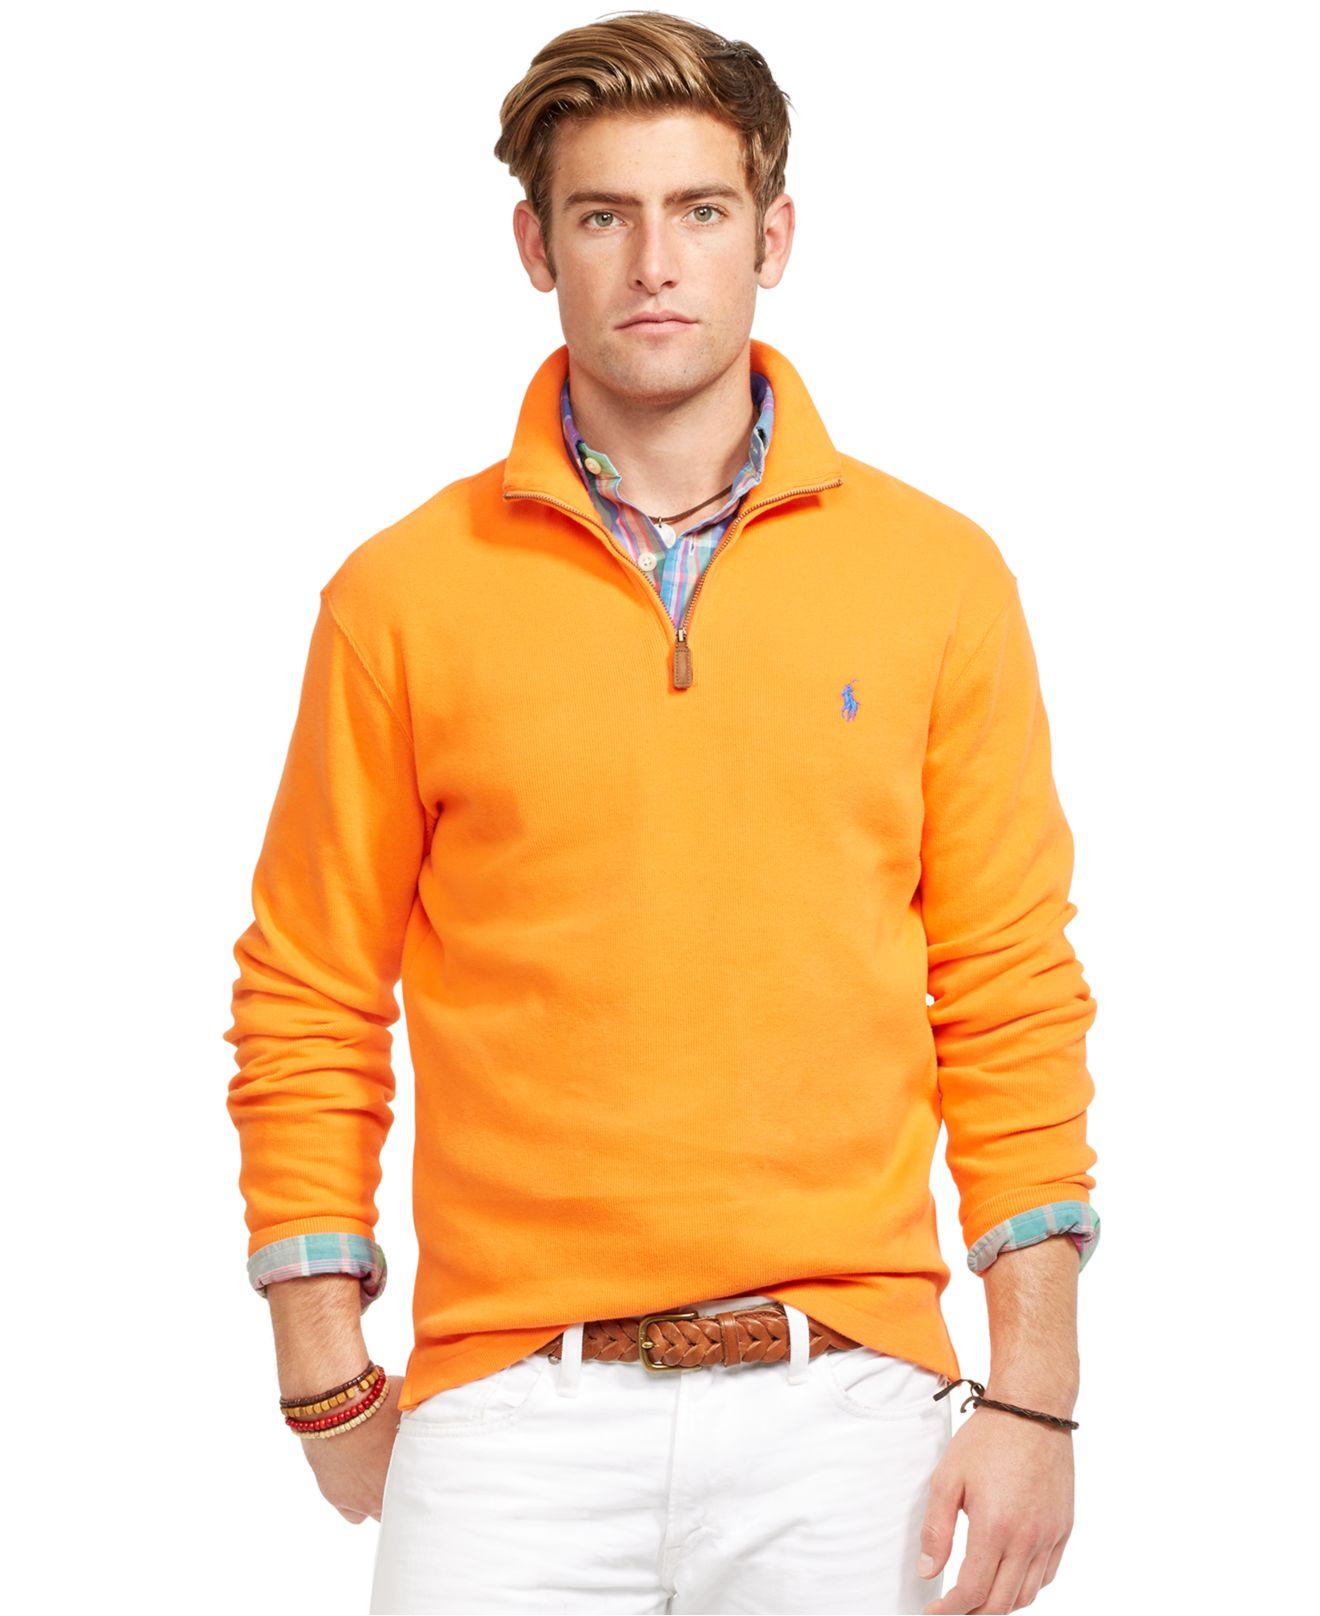 polo ralph lauren french rib mockneck pullover in orange for men bright papaya lyst. Black Bedroom Furniture Sets. Home Design Ideas